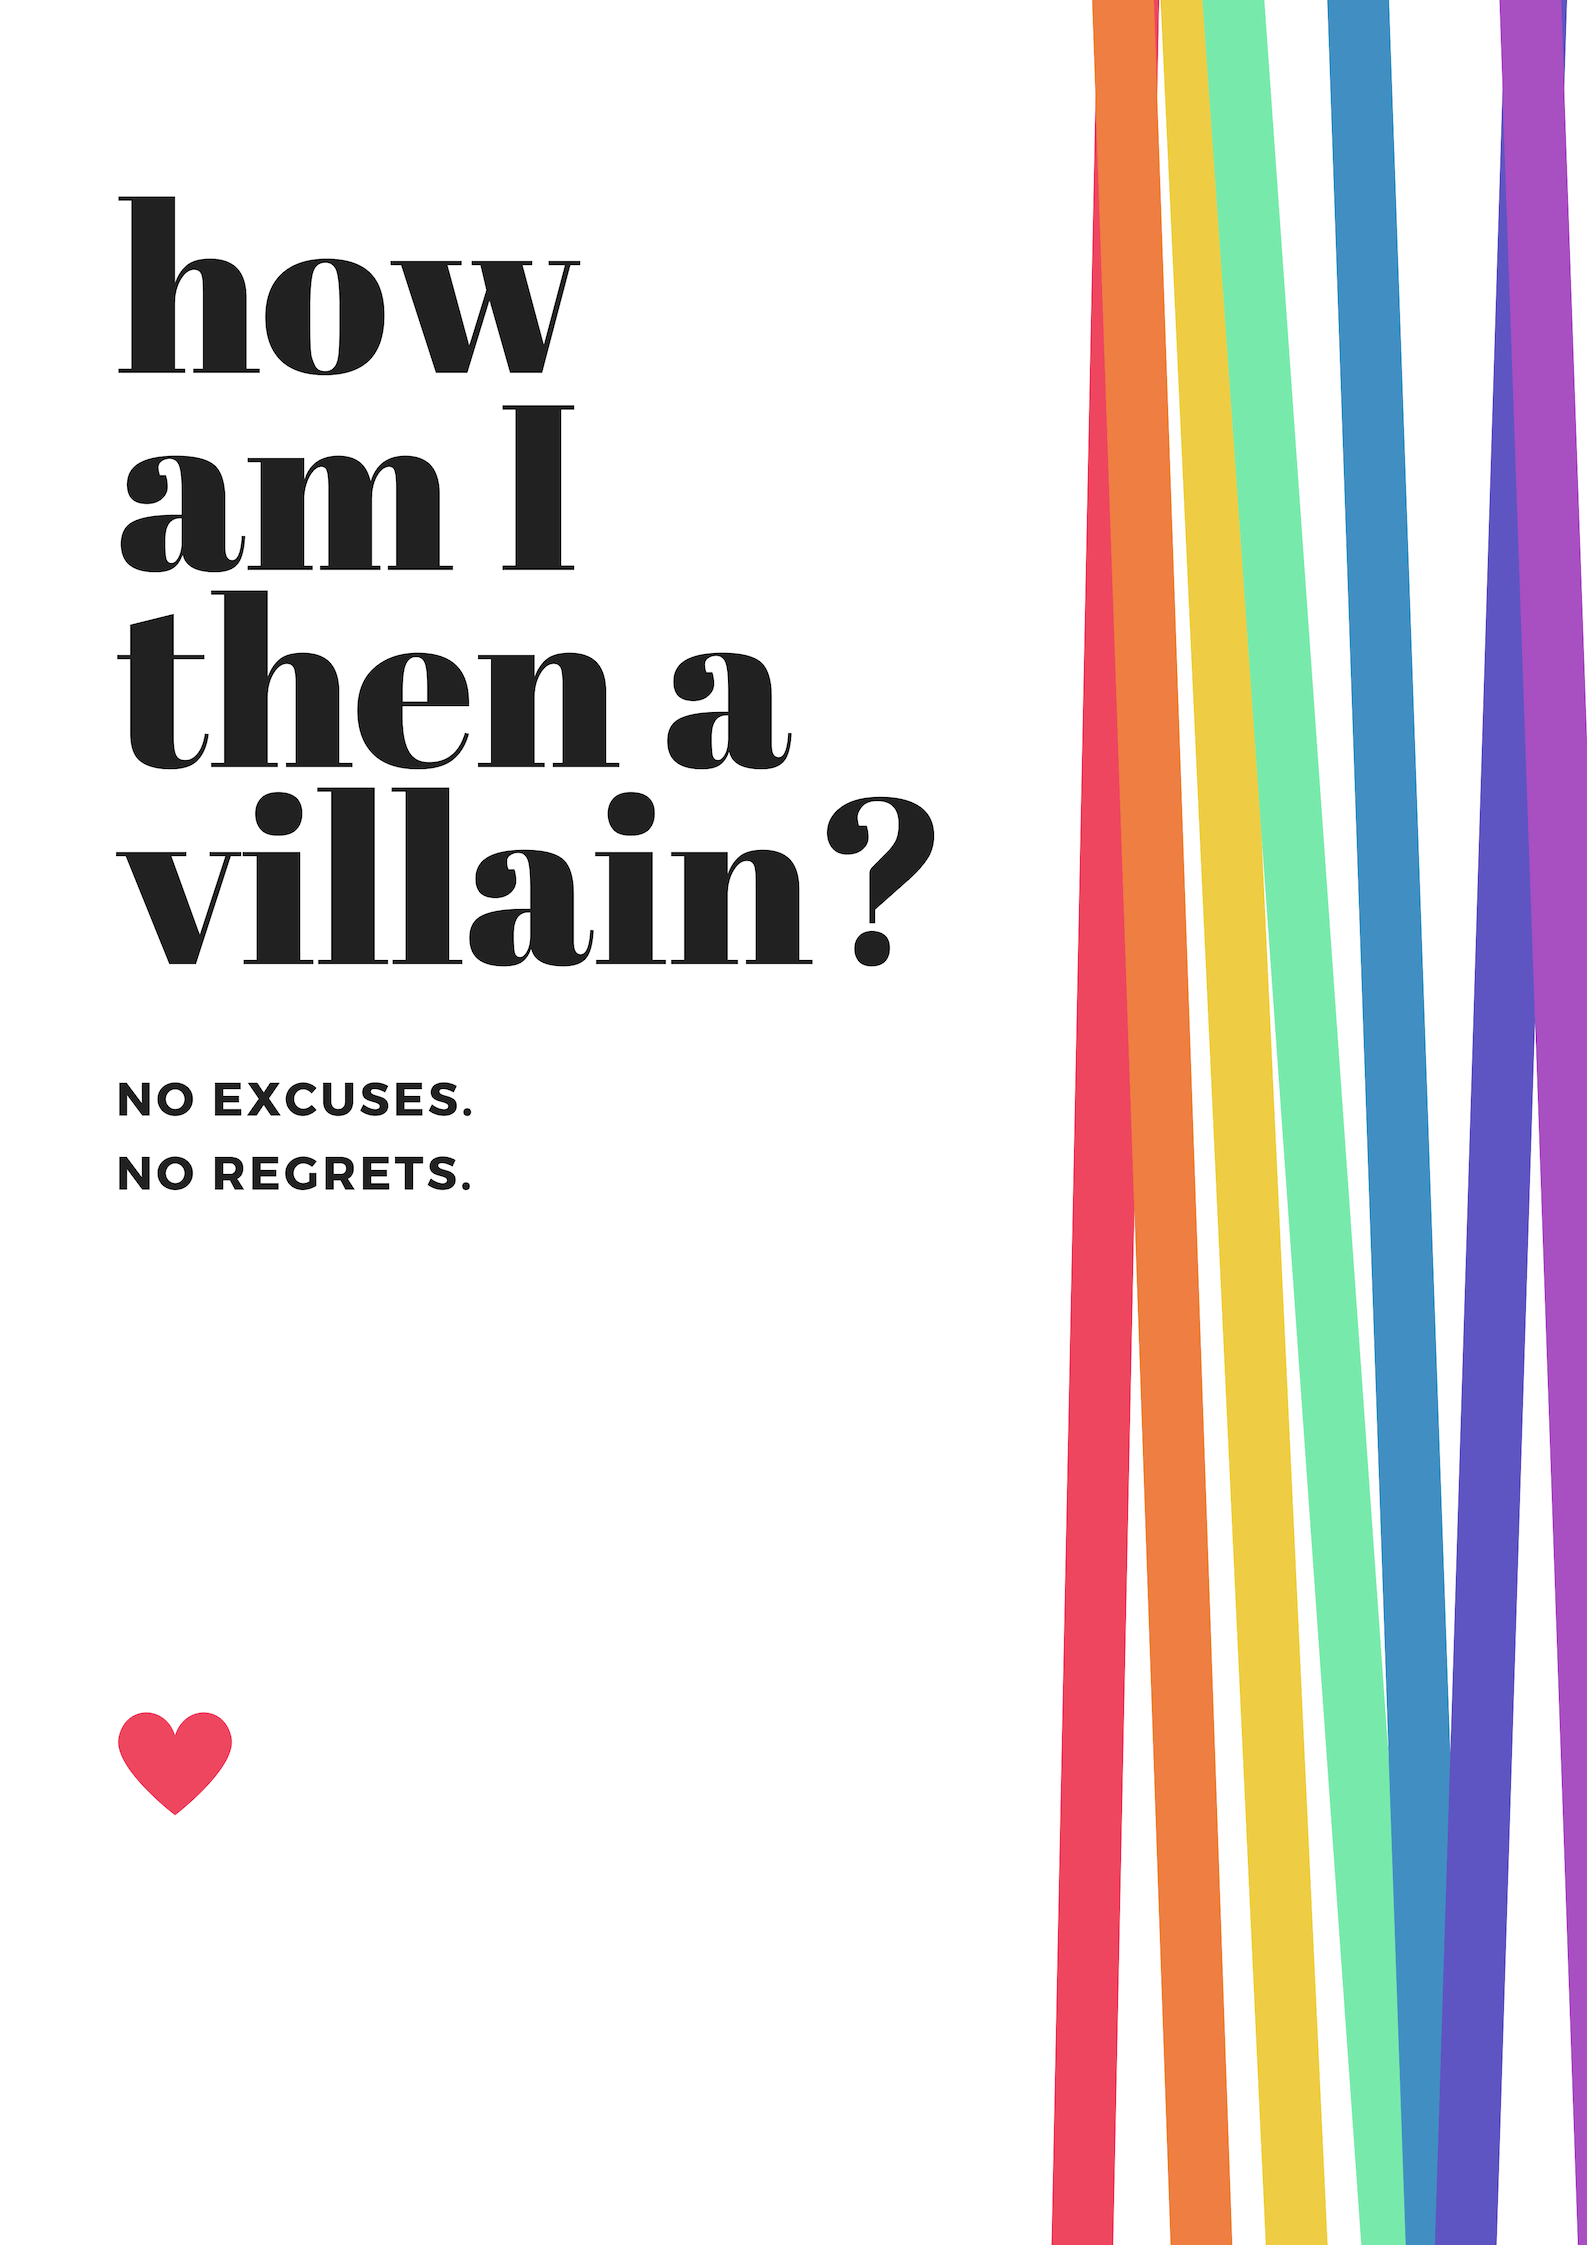 how am I then a villain?.png